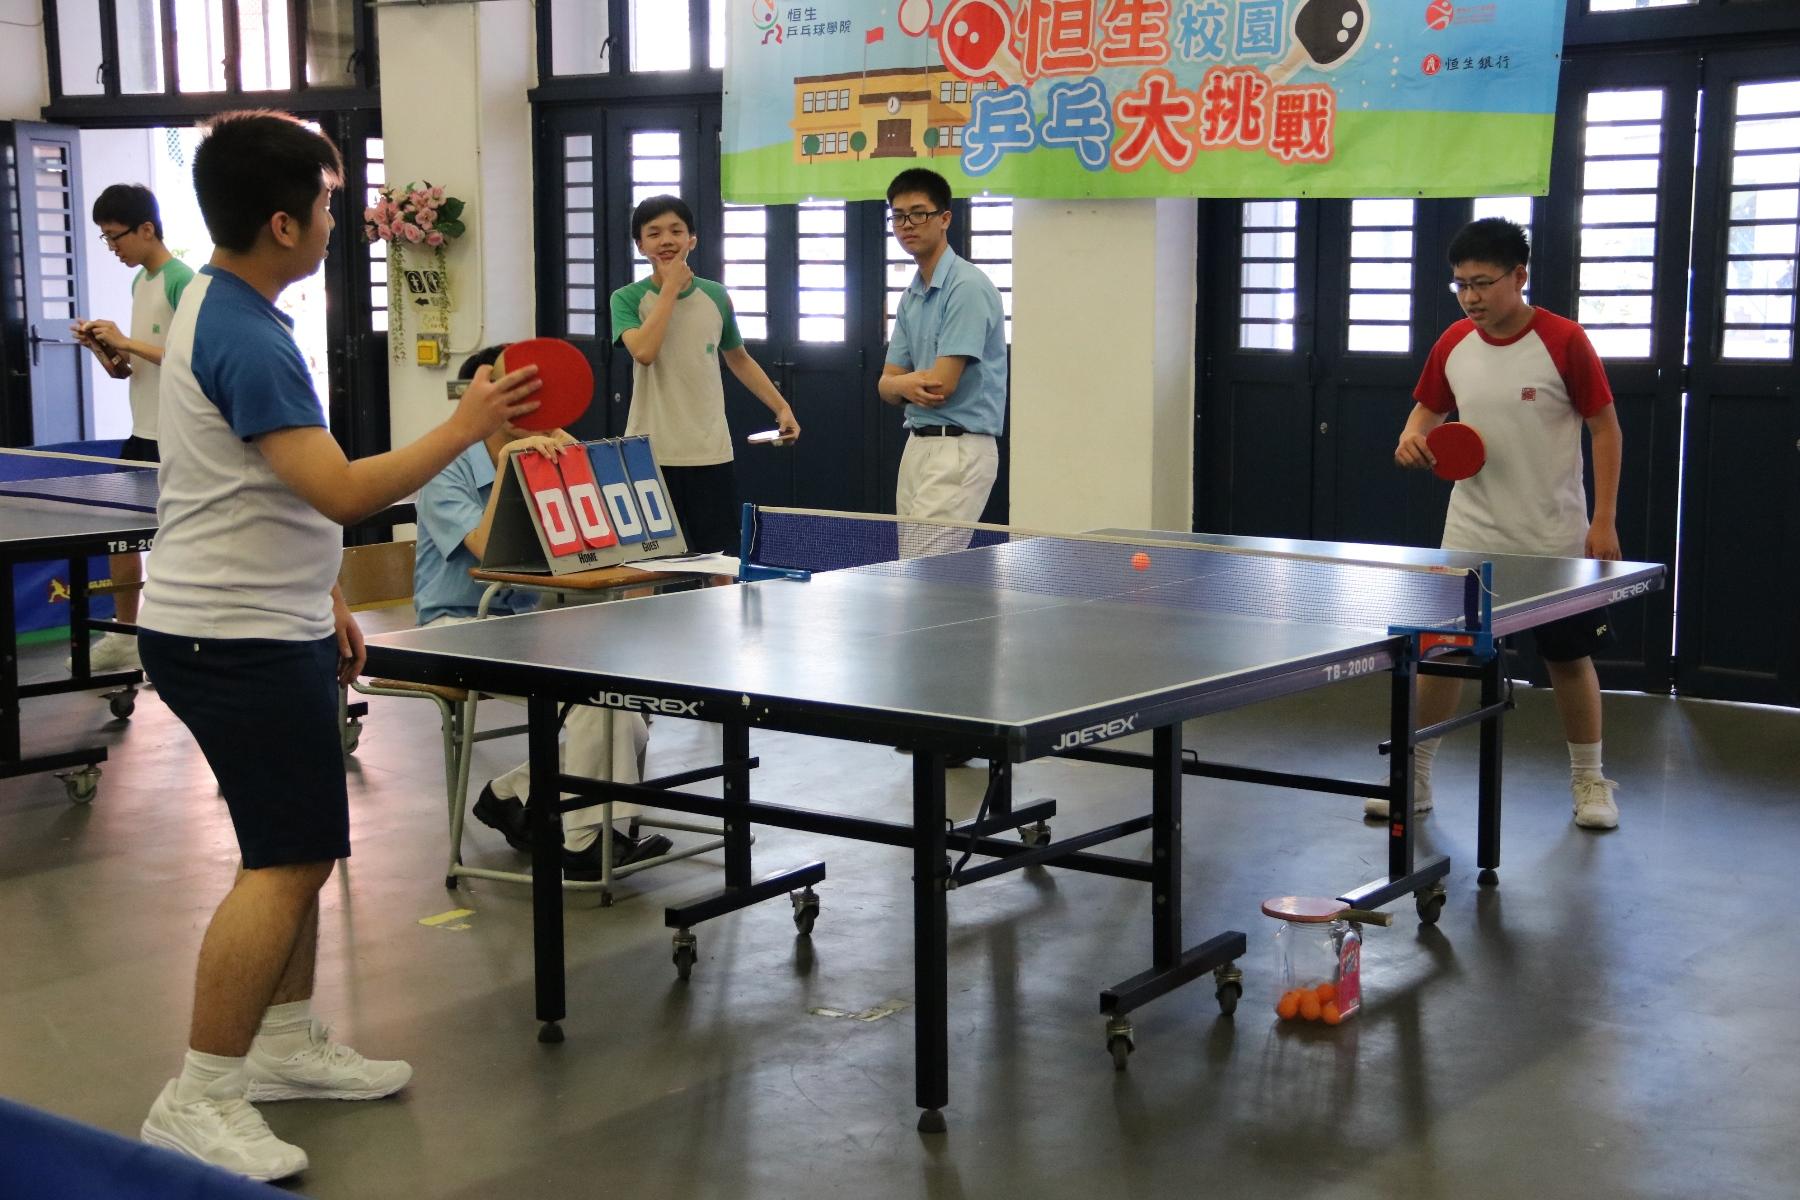 http://npc.edu.hk/sites/default/files/img_7538.jpg